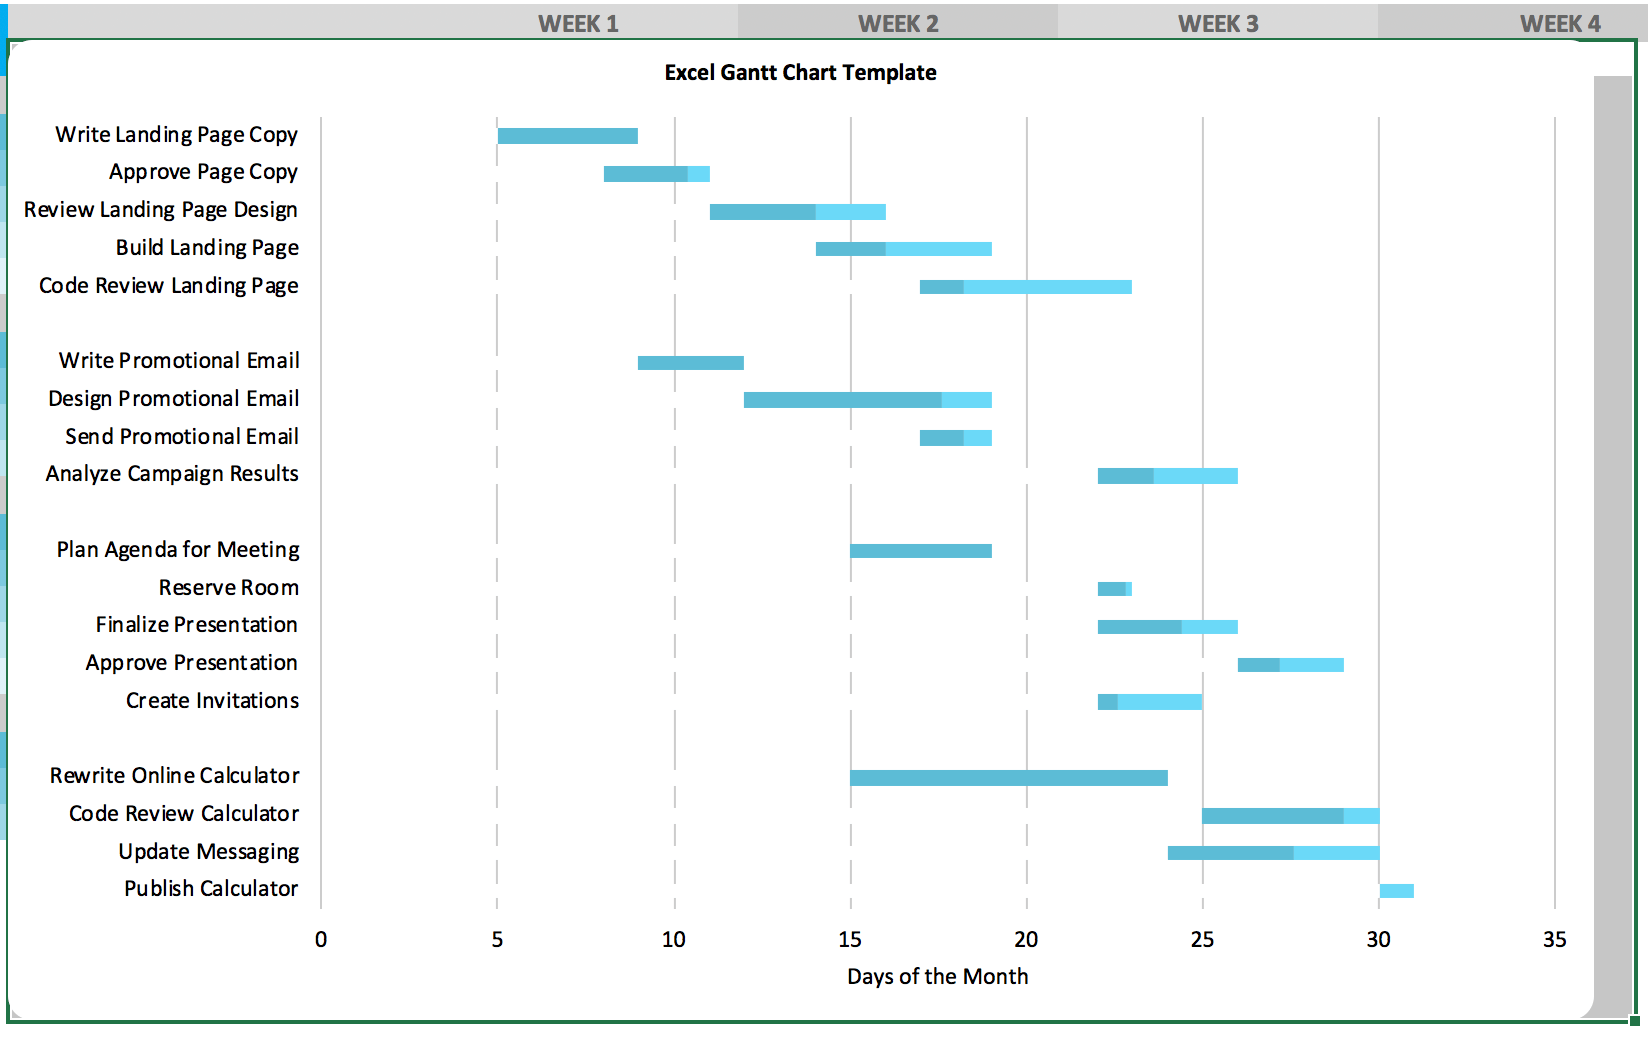 Document Of Gantt Chart Example Excel In Gantt Chart Example Excel Sheet